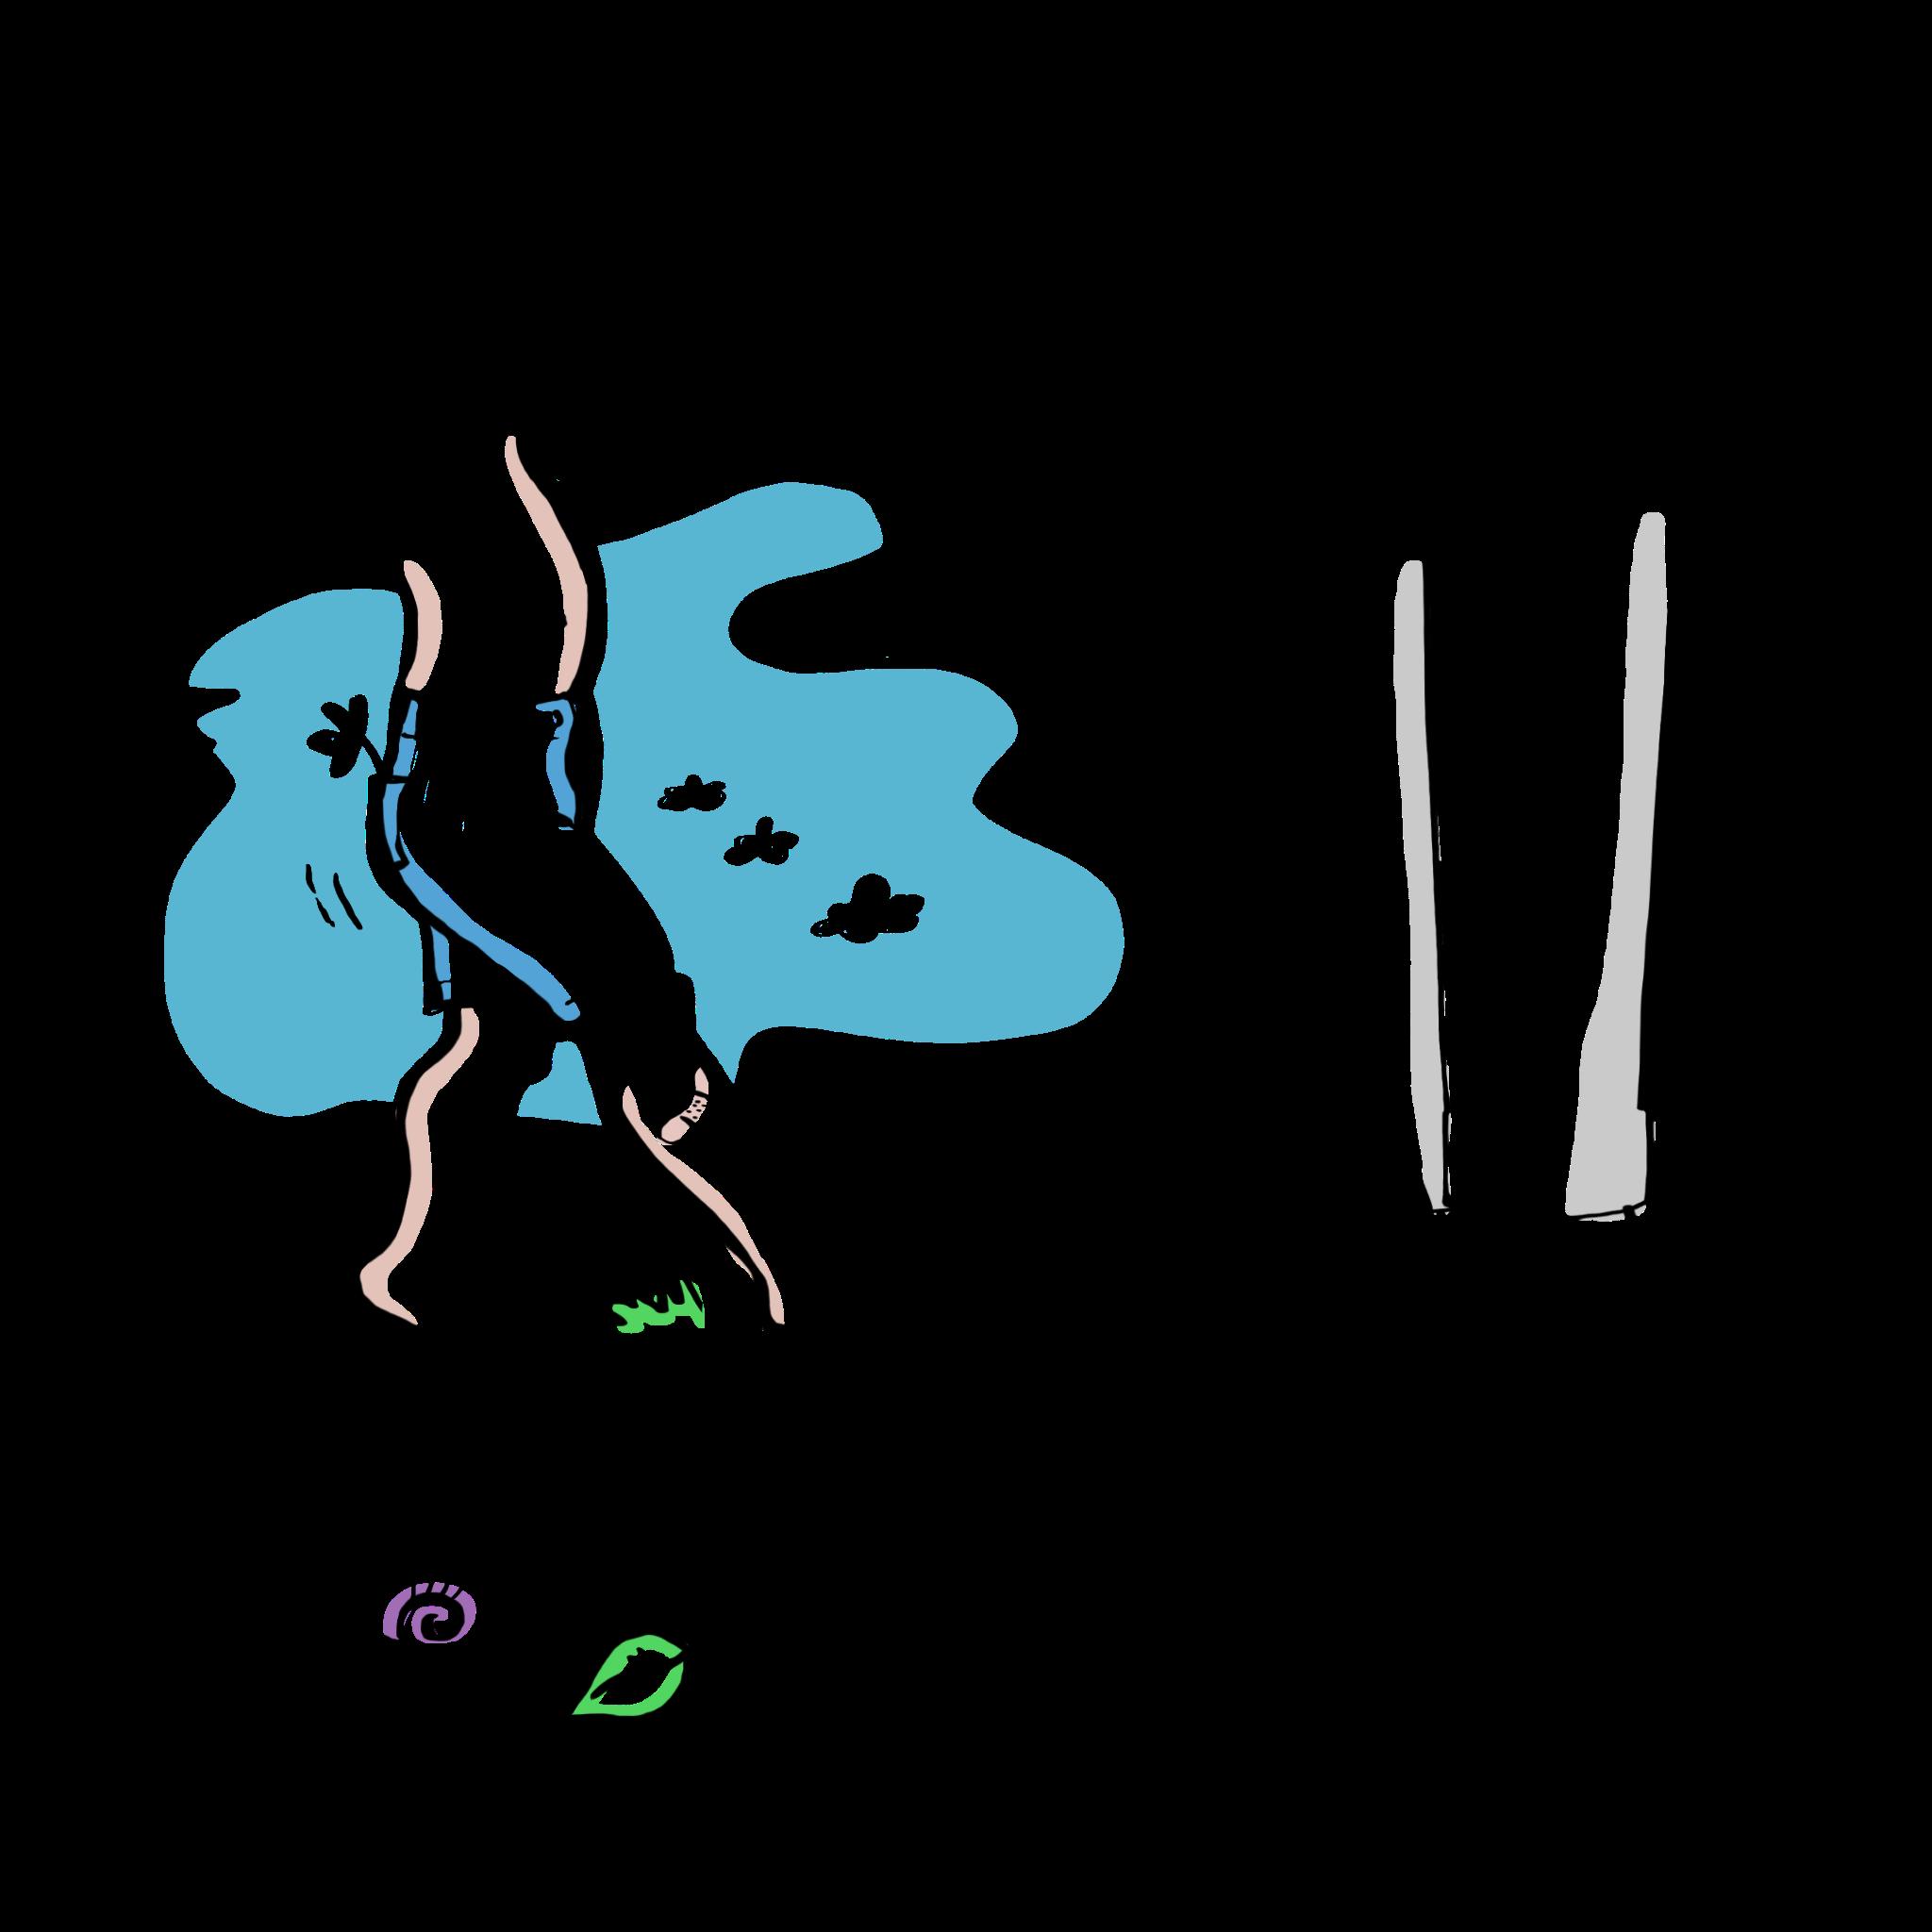 Träning-07-illustration-maja-larsson